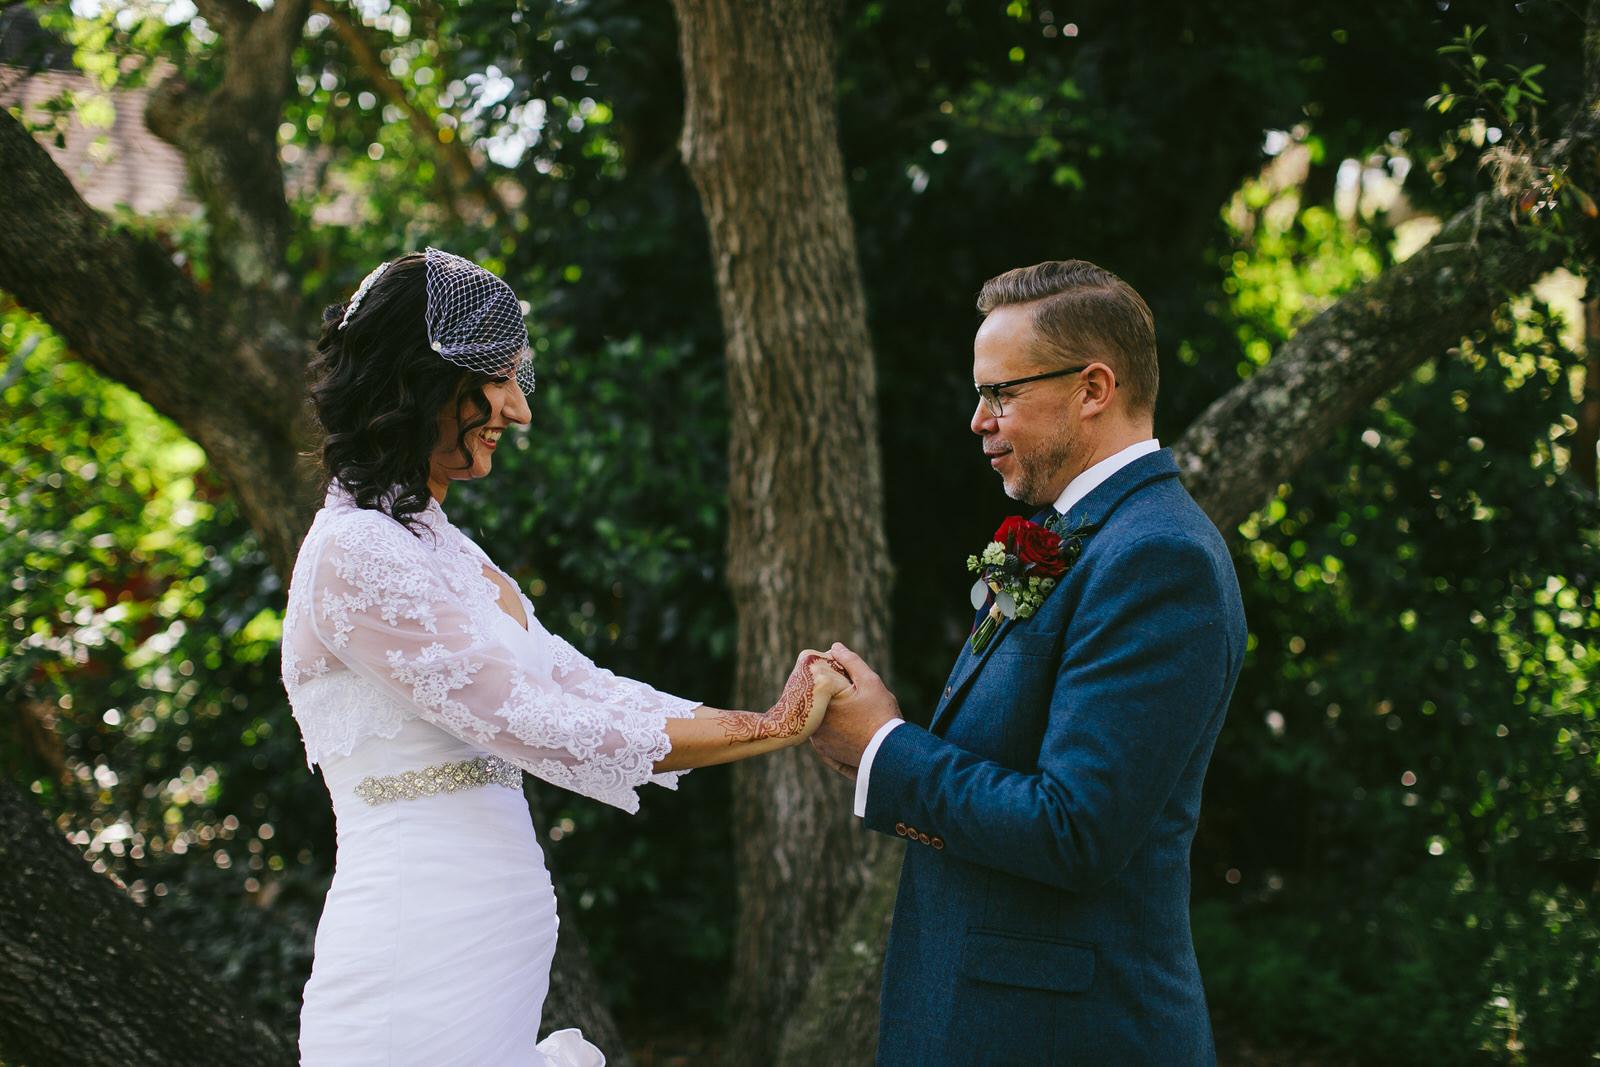 first-look-bride-groom-kashi-ashram-wedding-sebastian-florida-tiny-house-photo.jpg